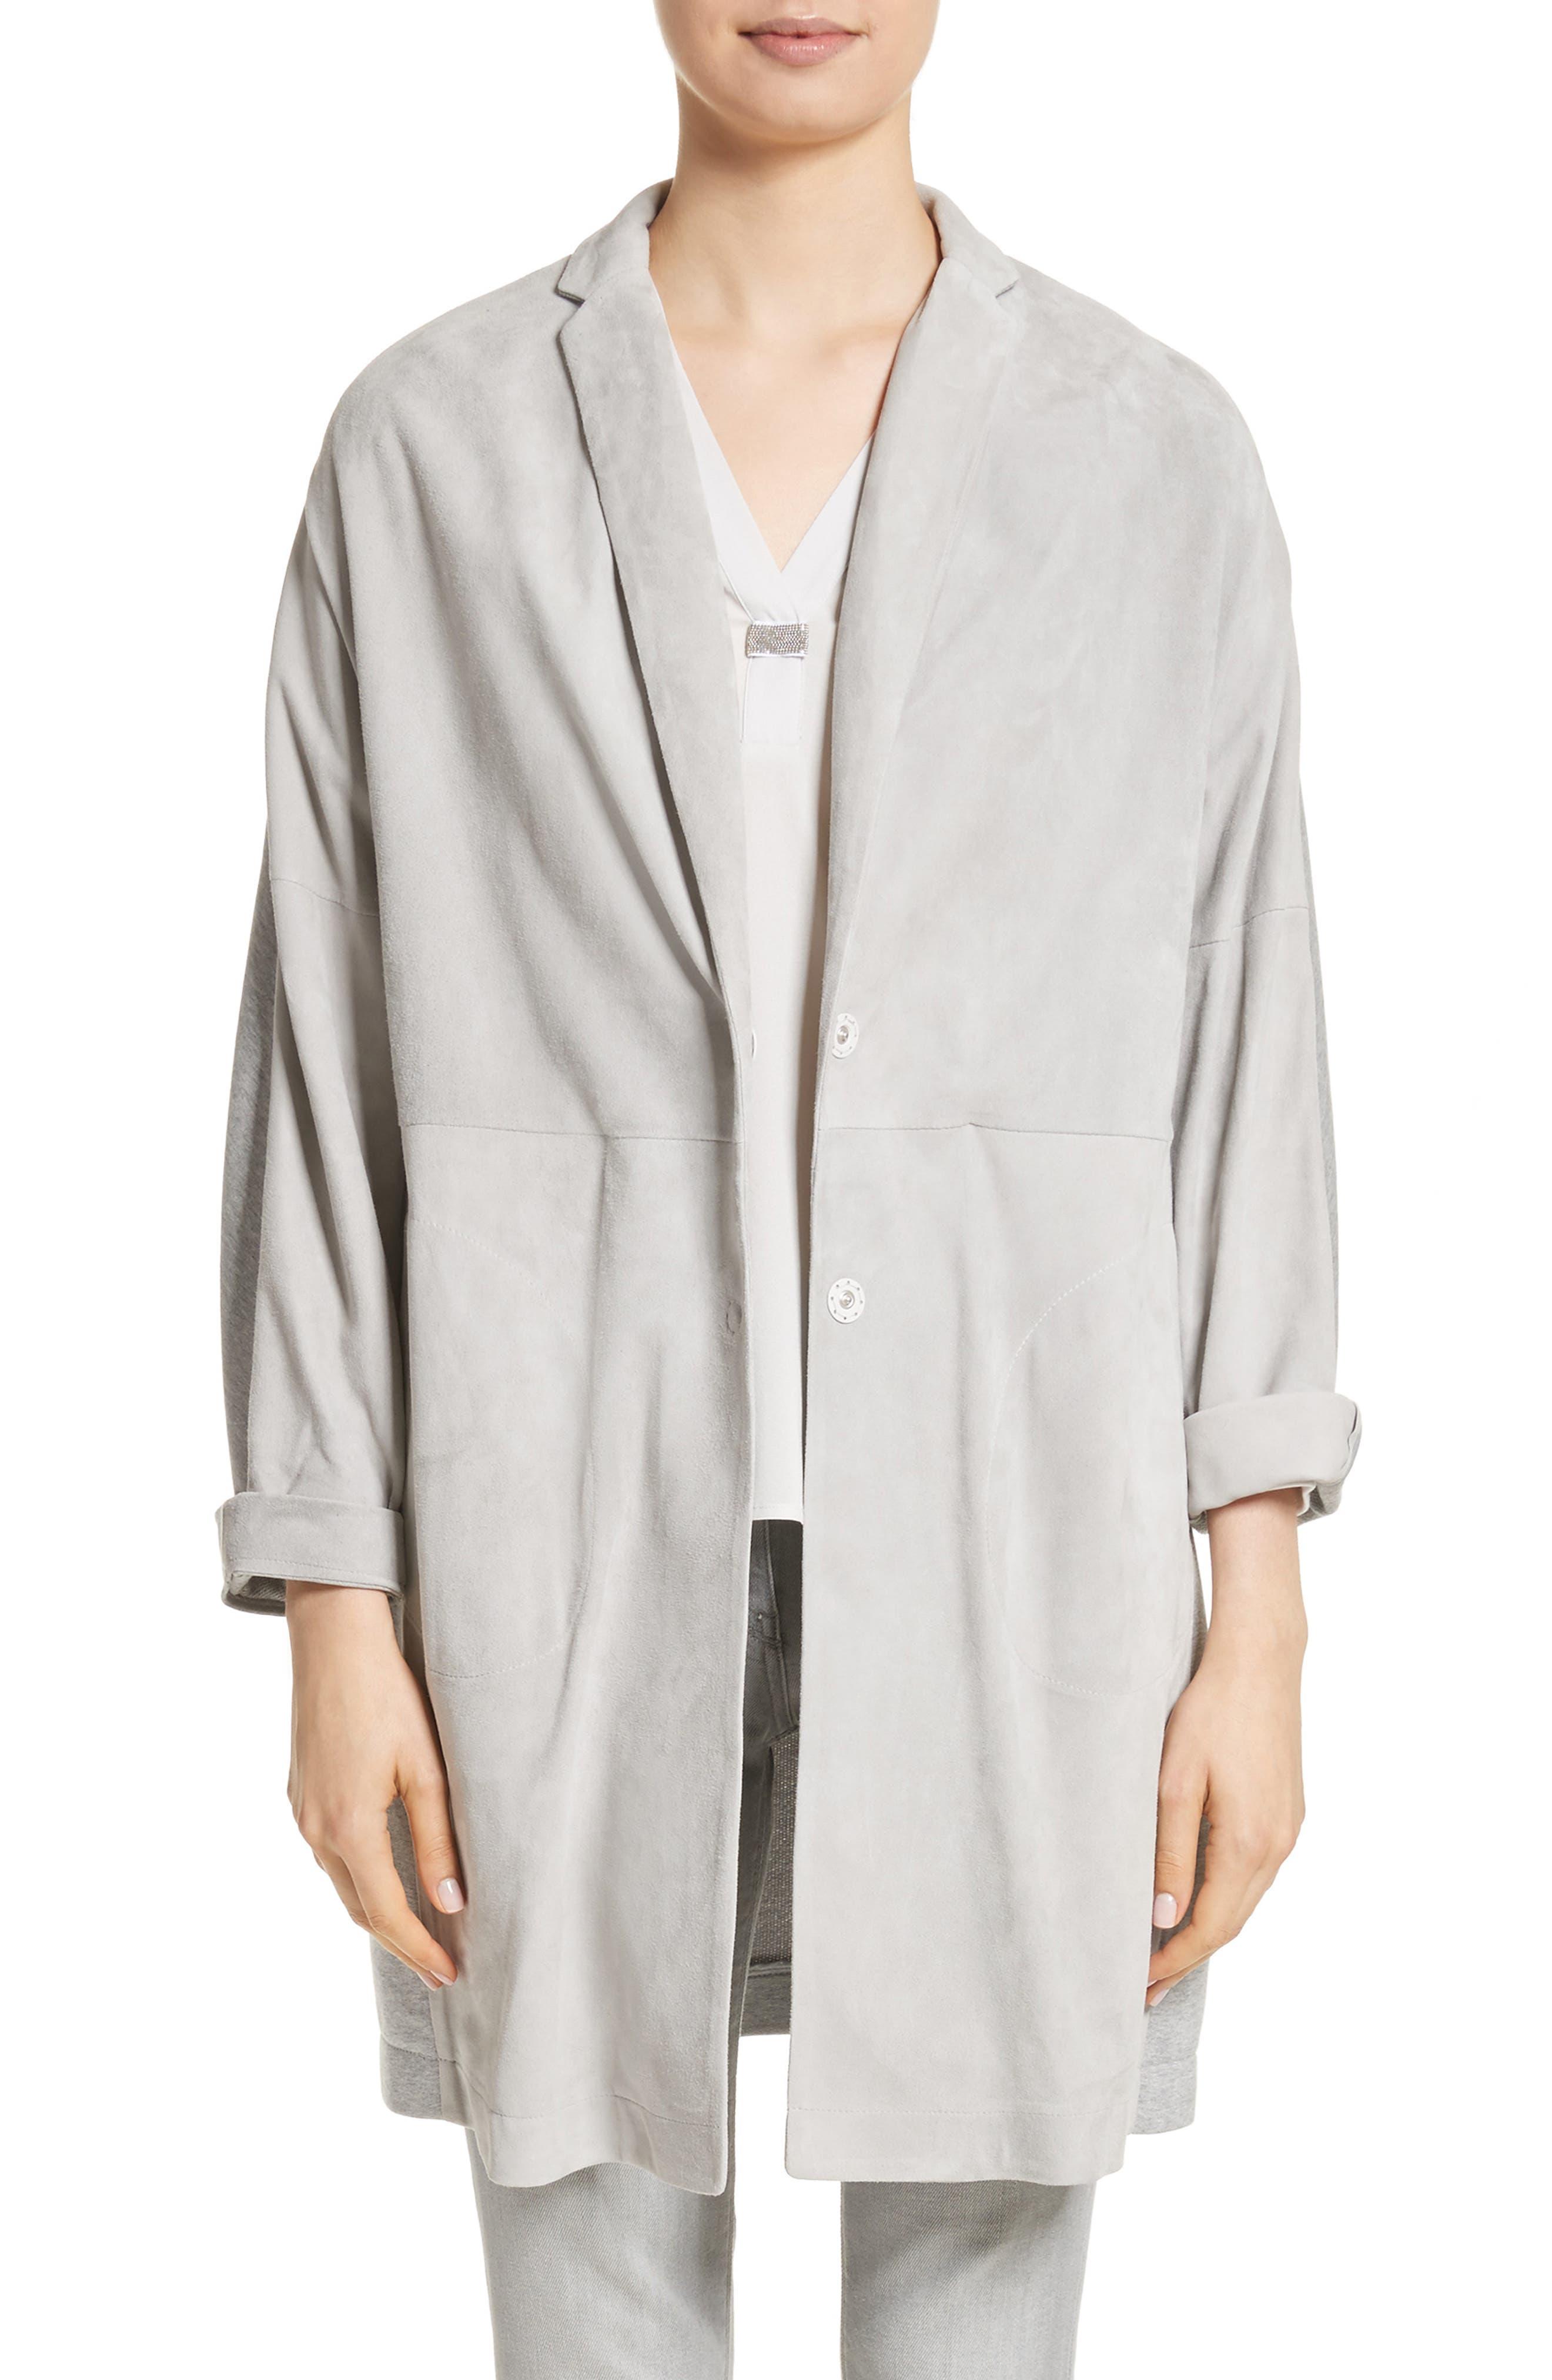 Fabiana Filippi Suede Front Jersey Jacket